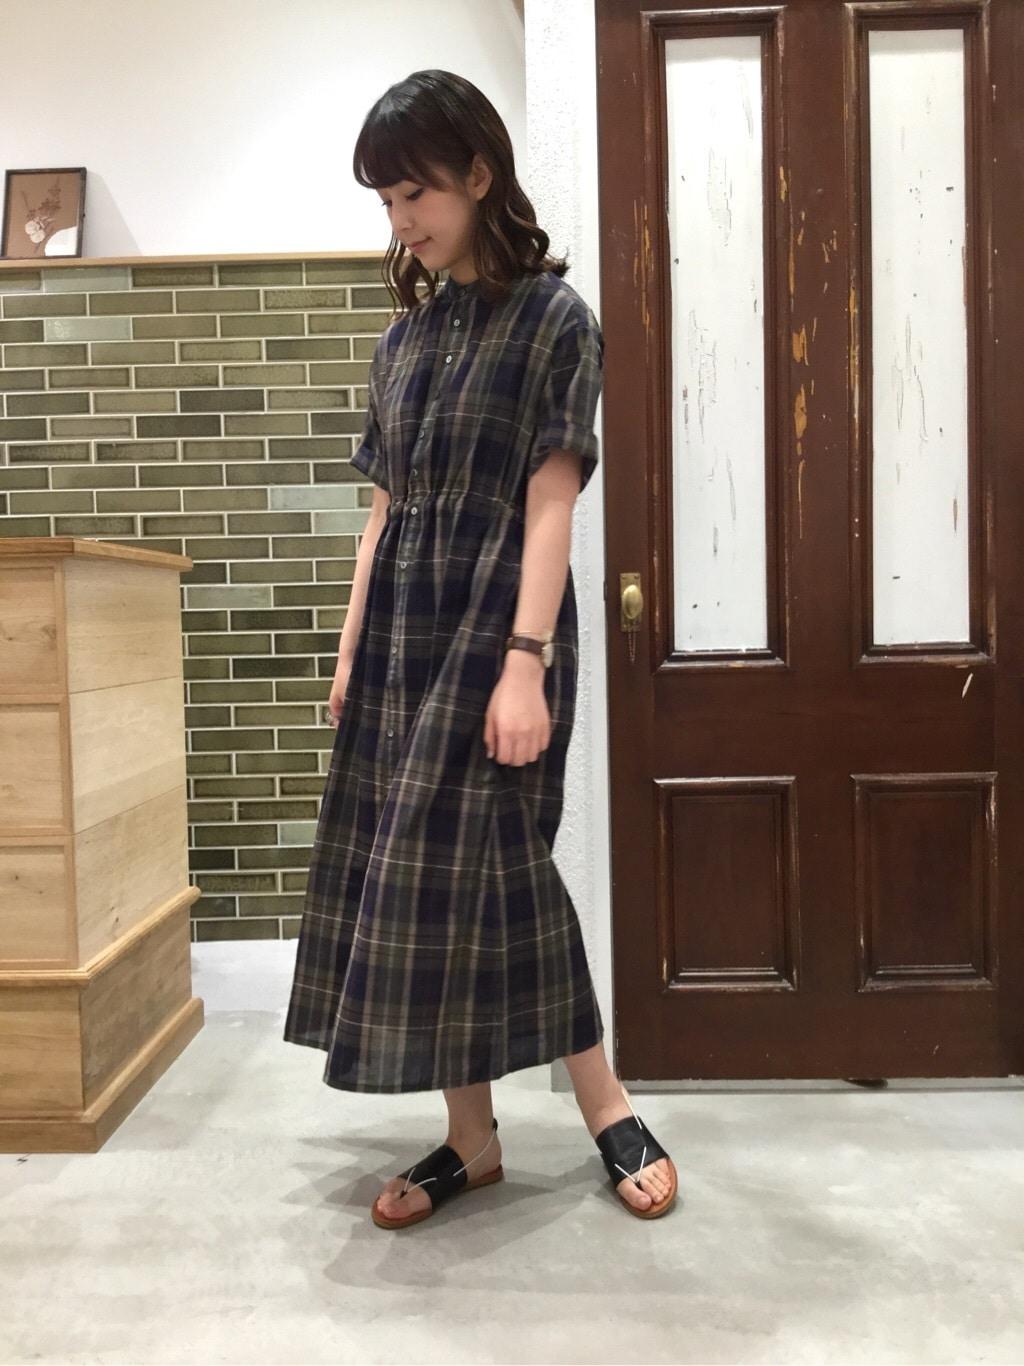 chambre de charme 横浜ジョイナス 身長:162cm 2020.08.26